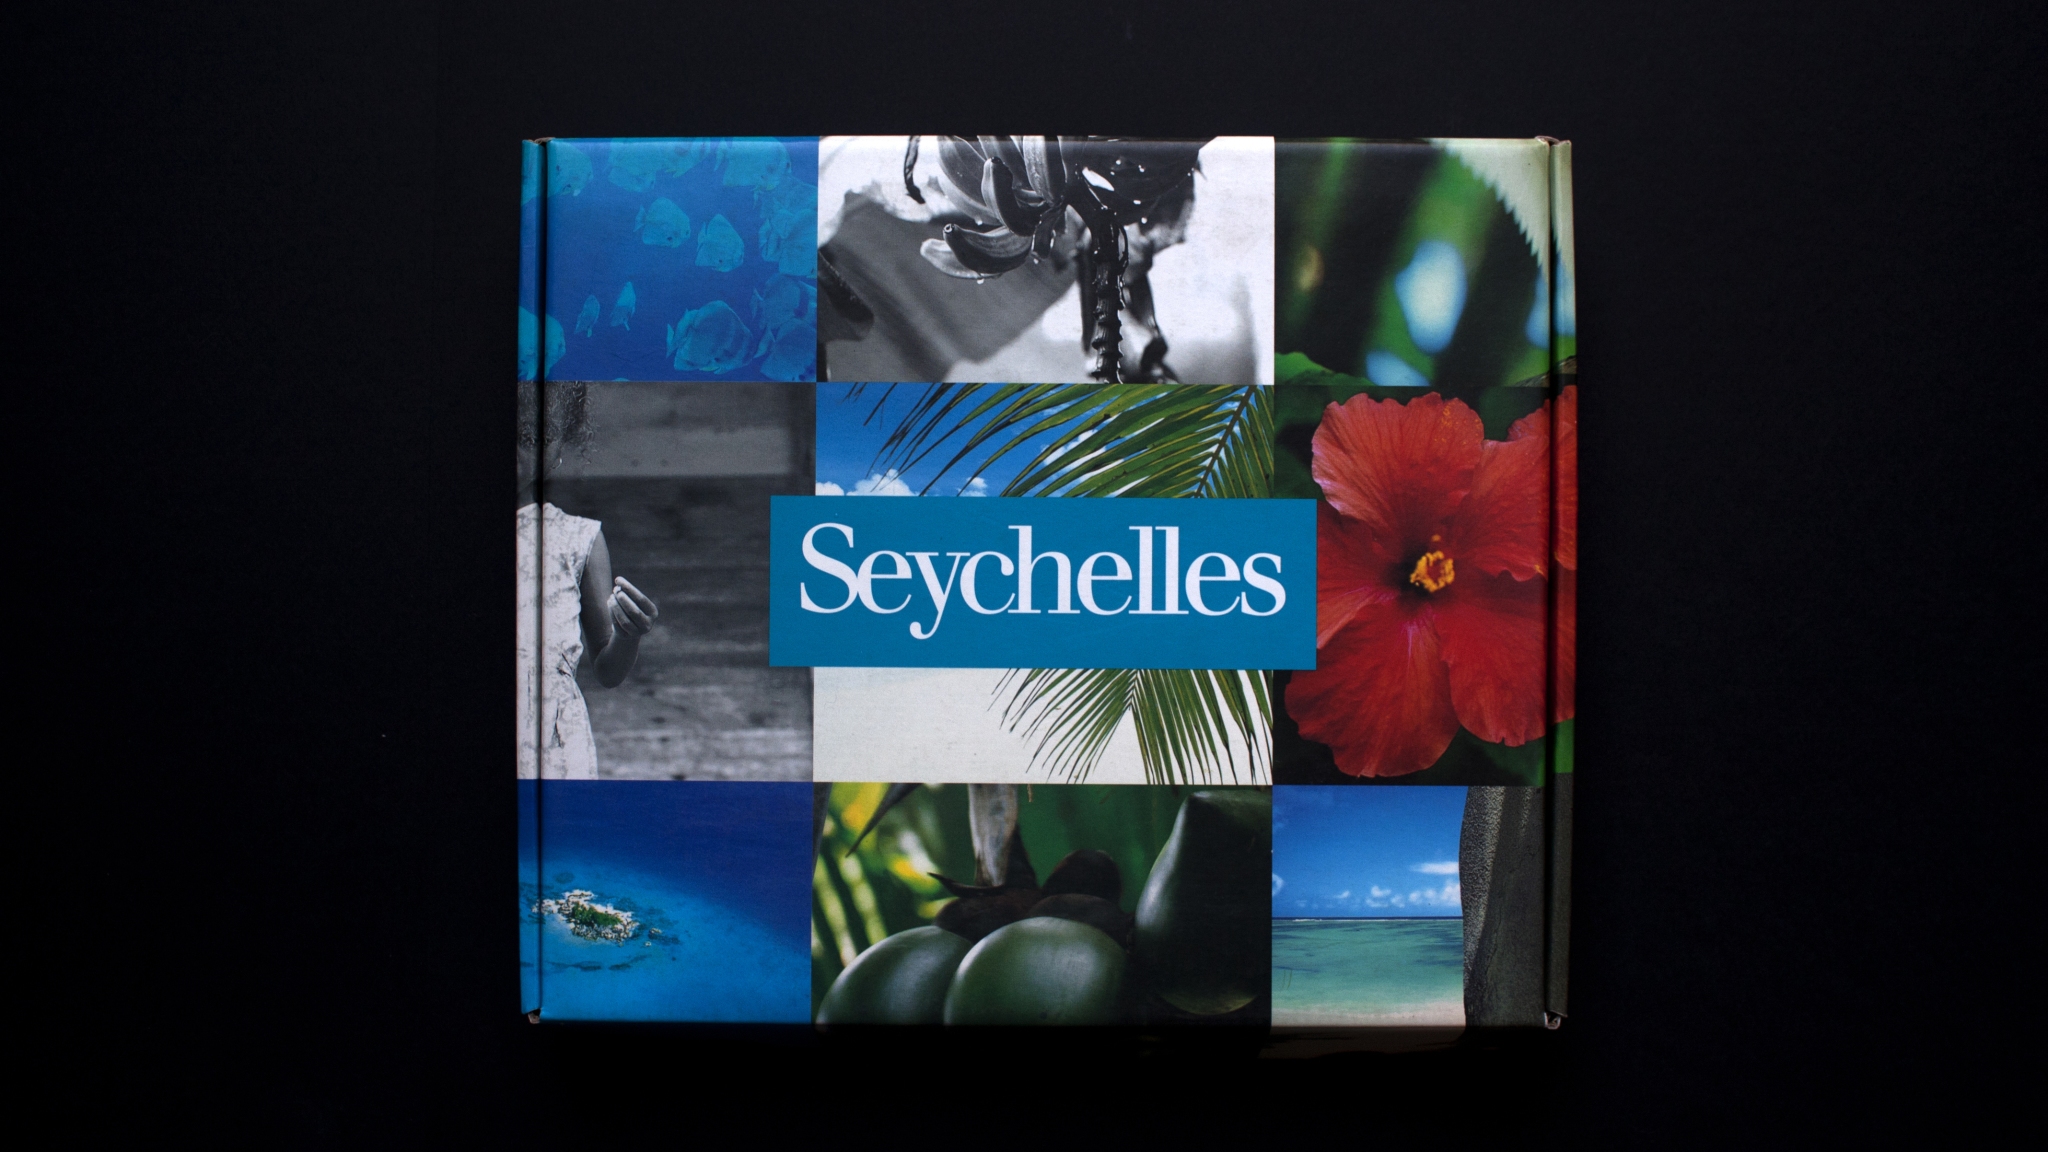 Tourism Office Seychelles